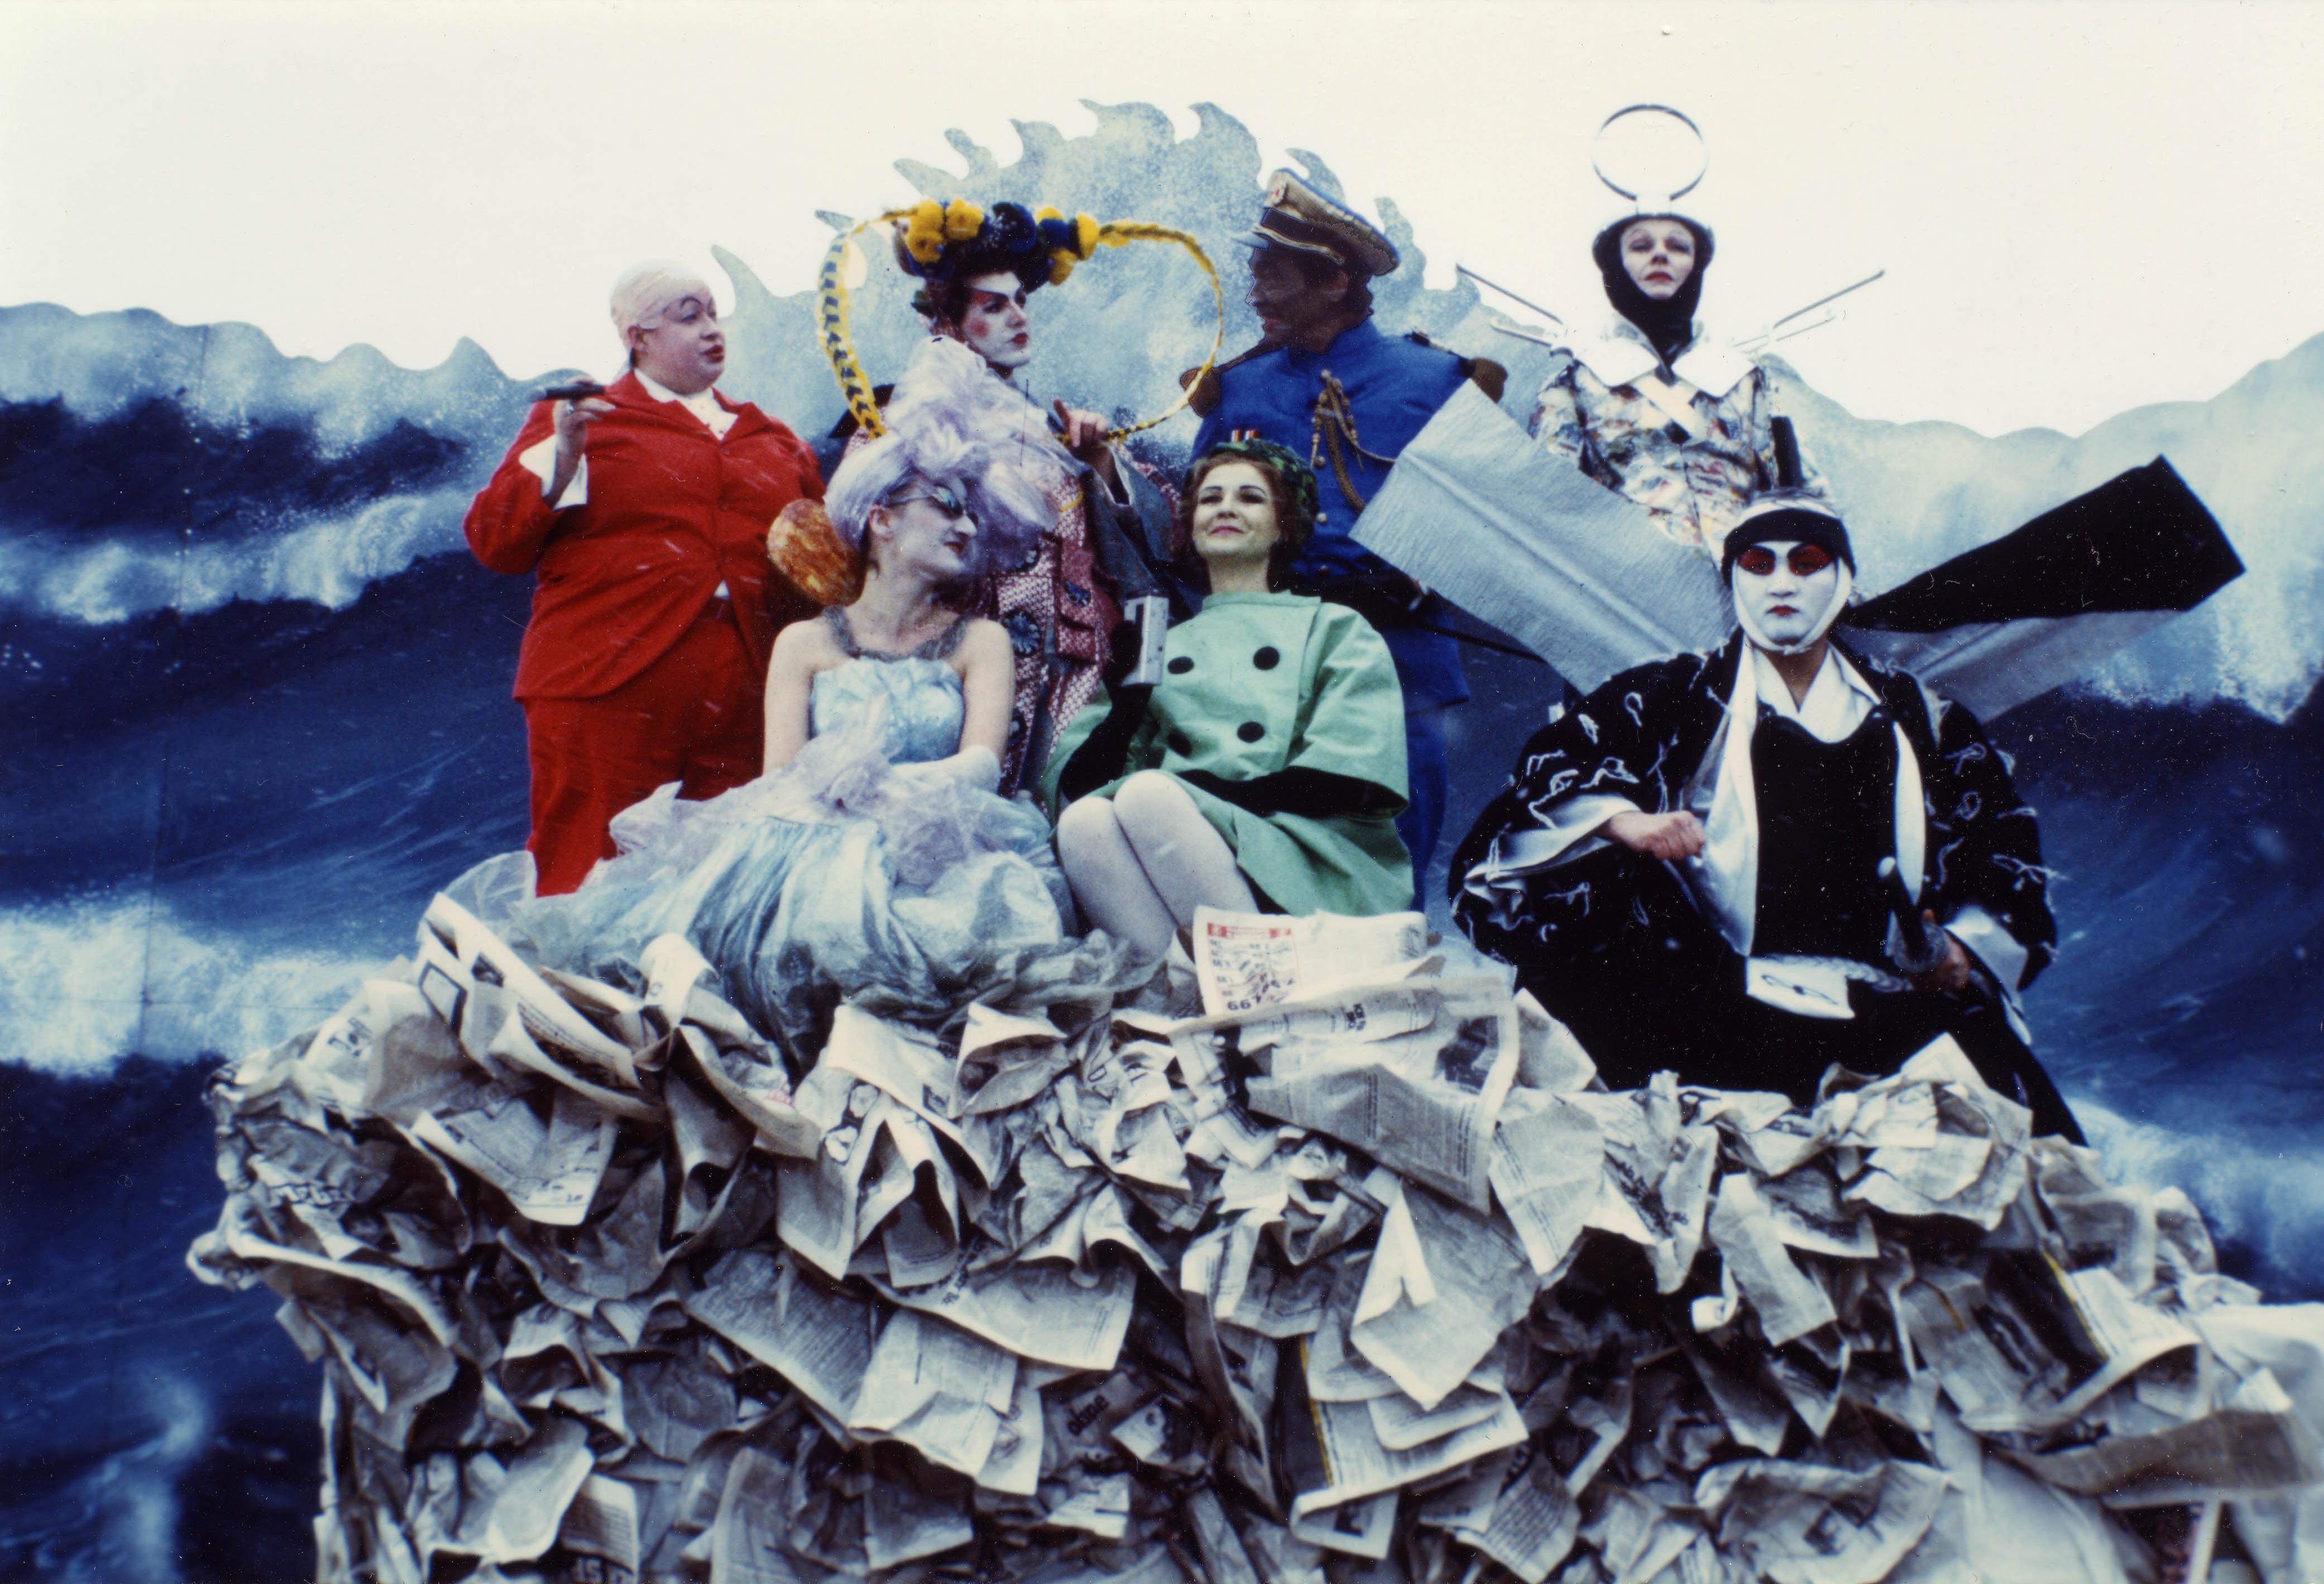 Ulrike Ottinger, 'SUPERBIA – The Pride', 1986